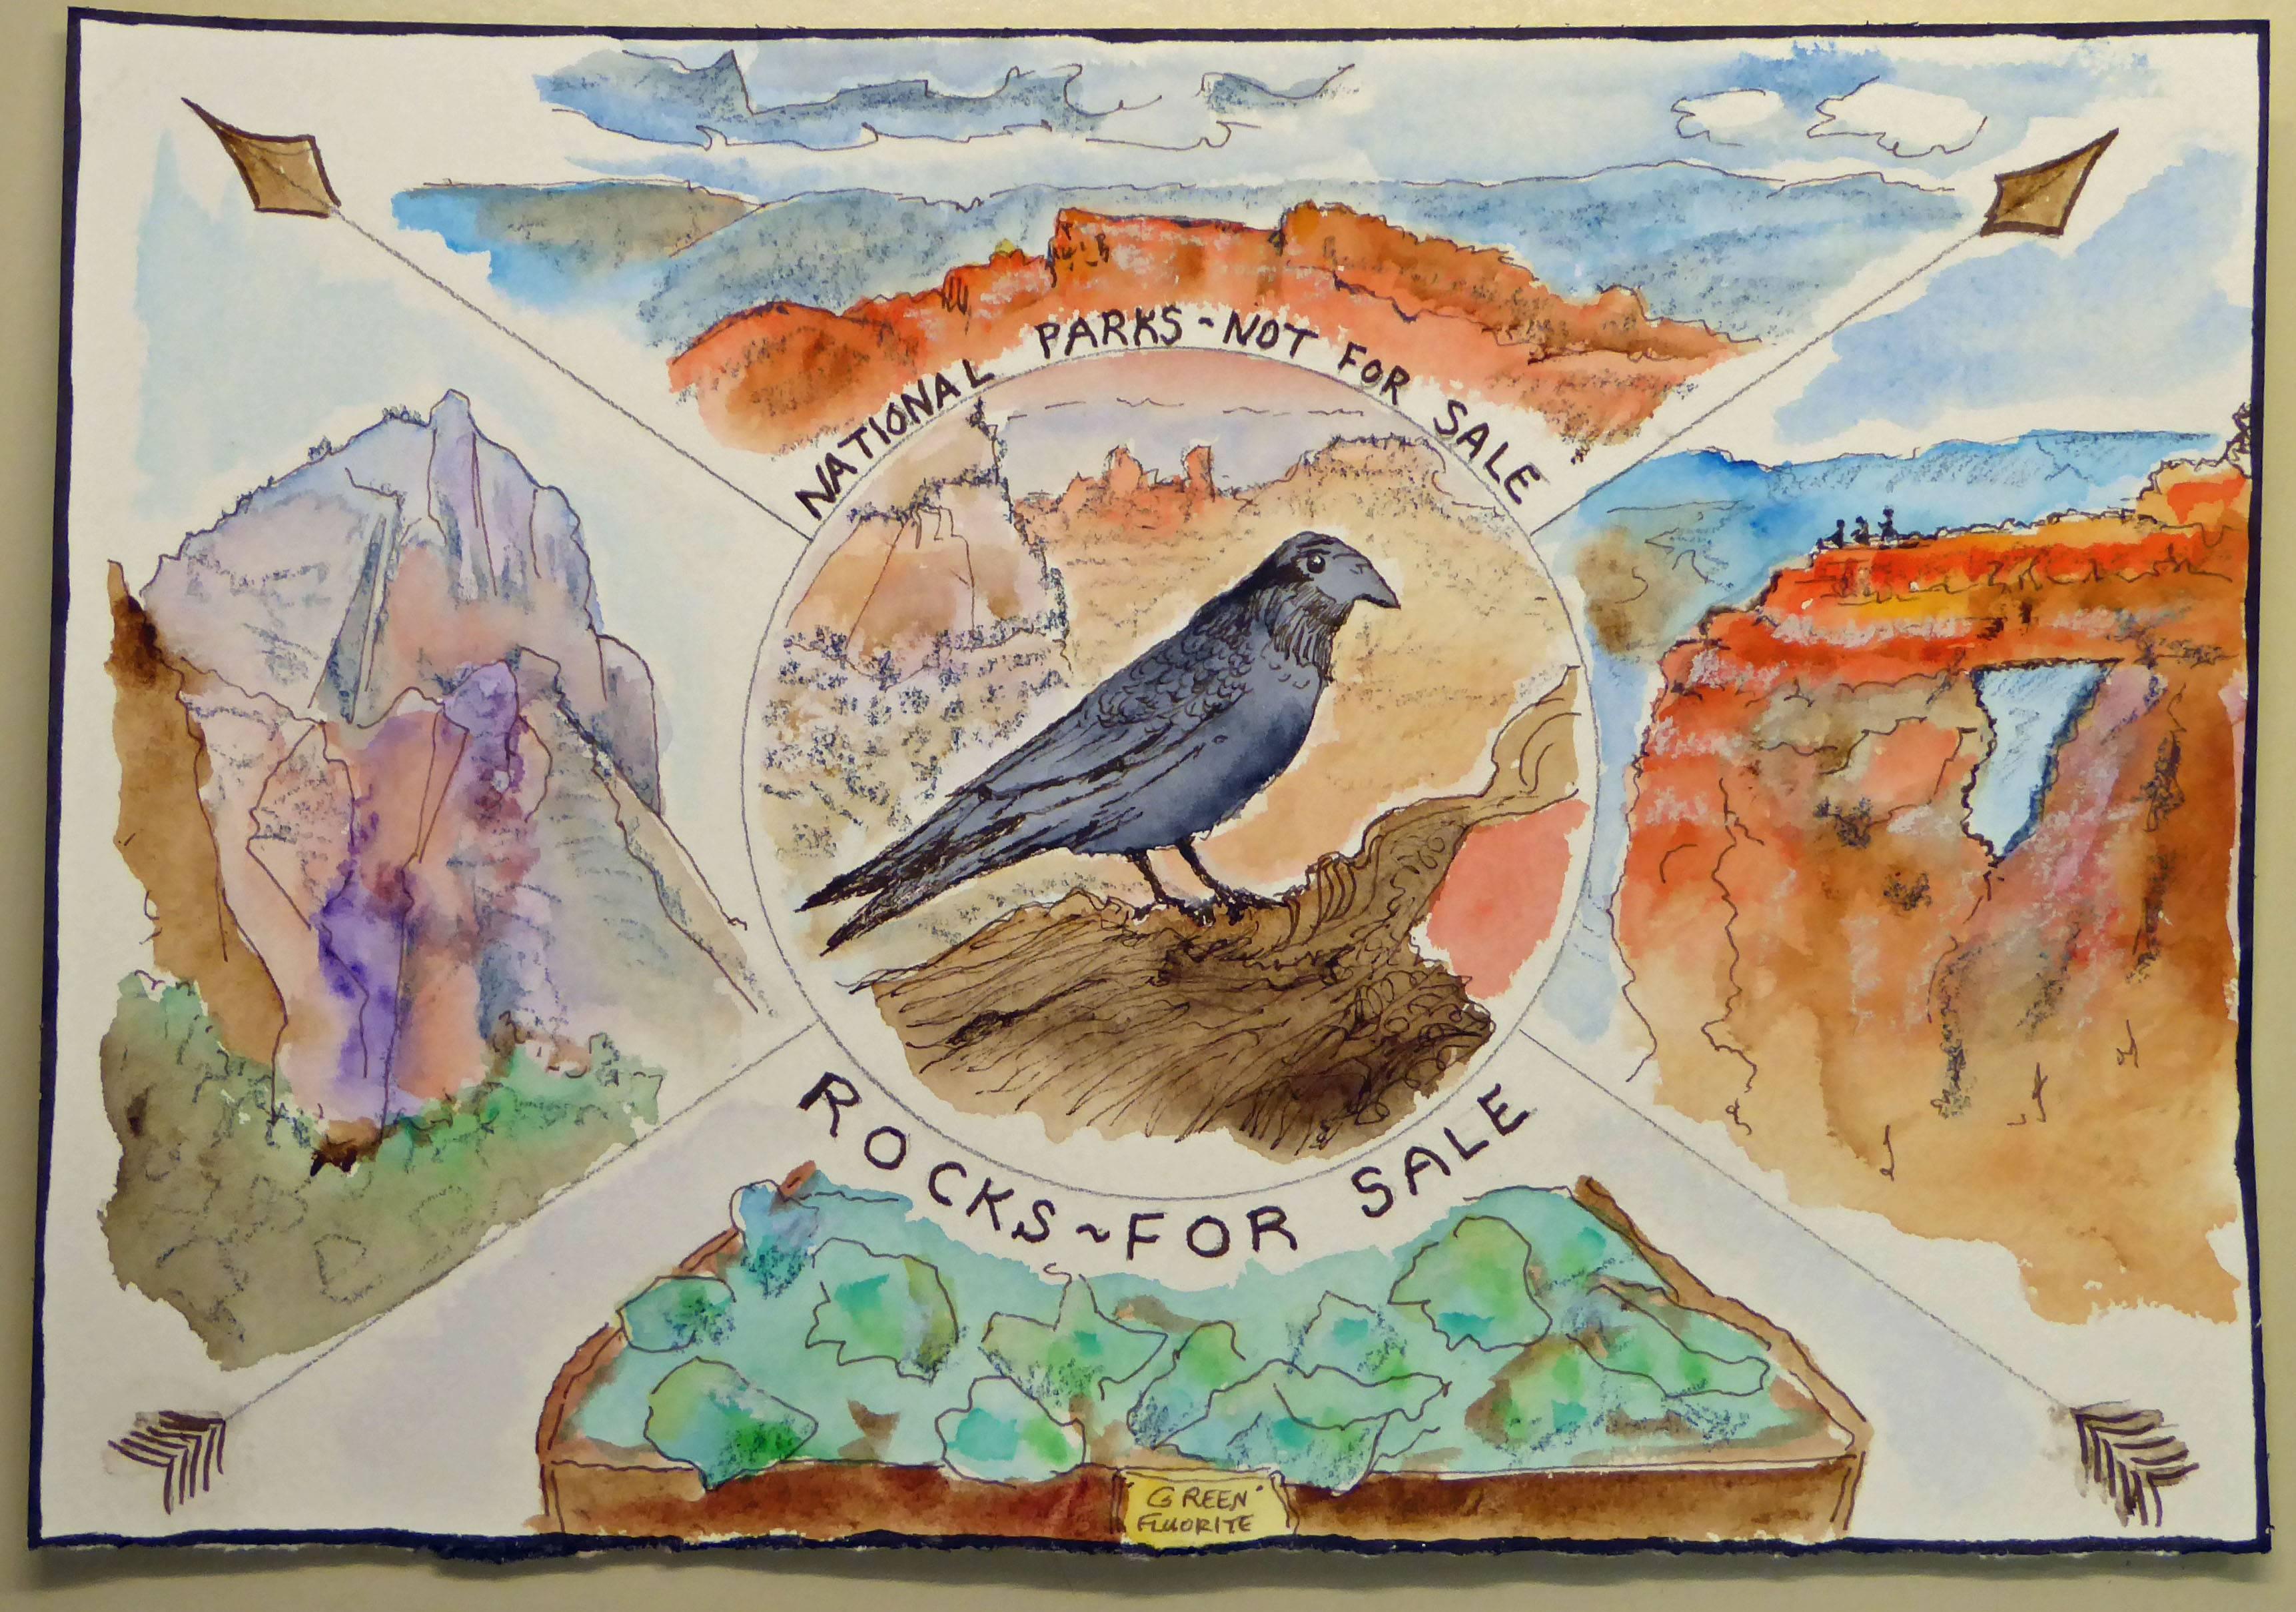 Raven's Home - Grand Canyon NP